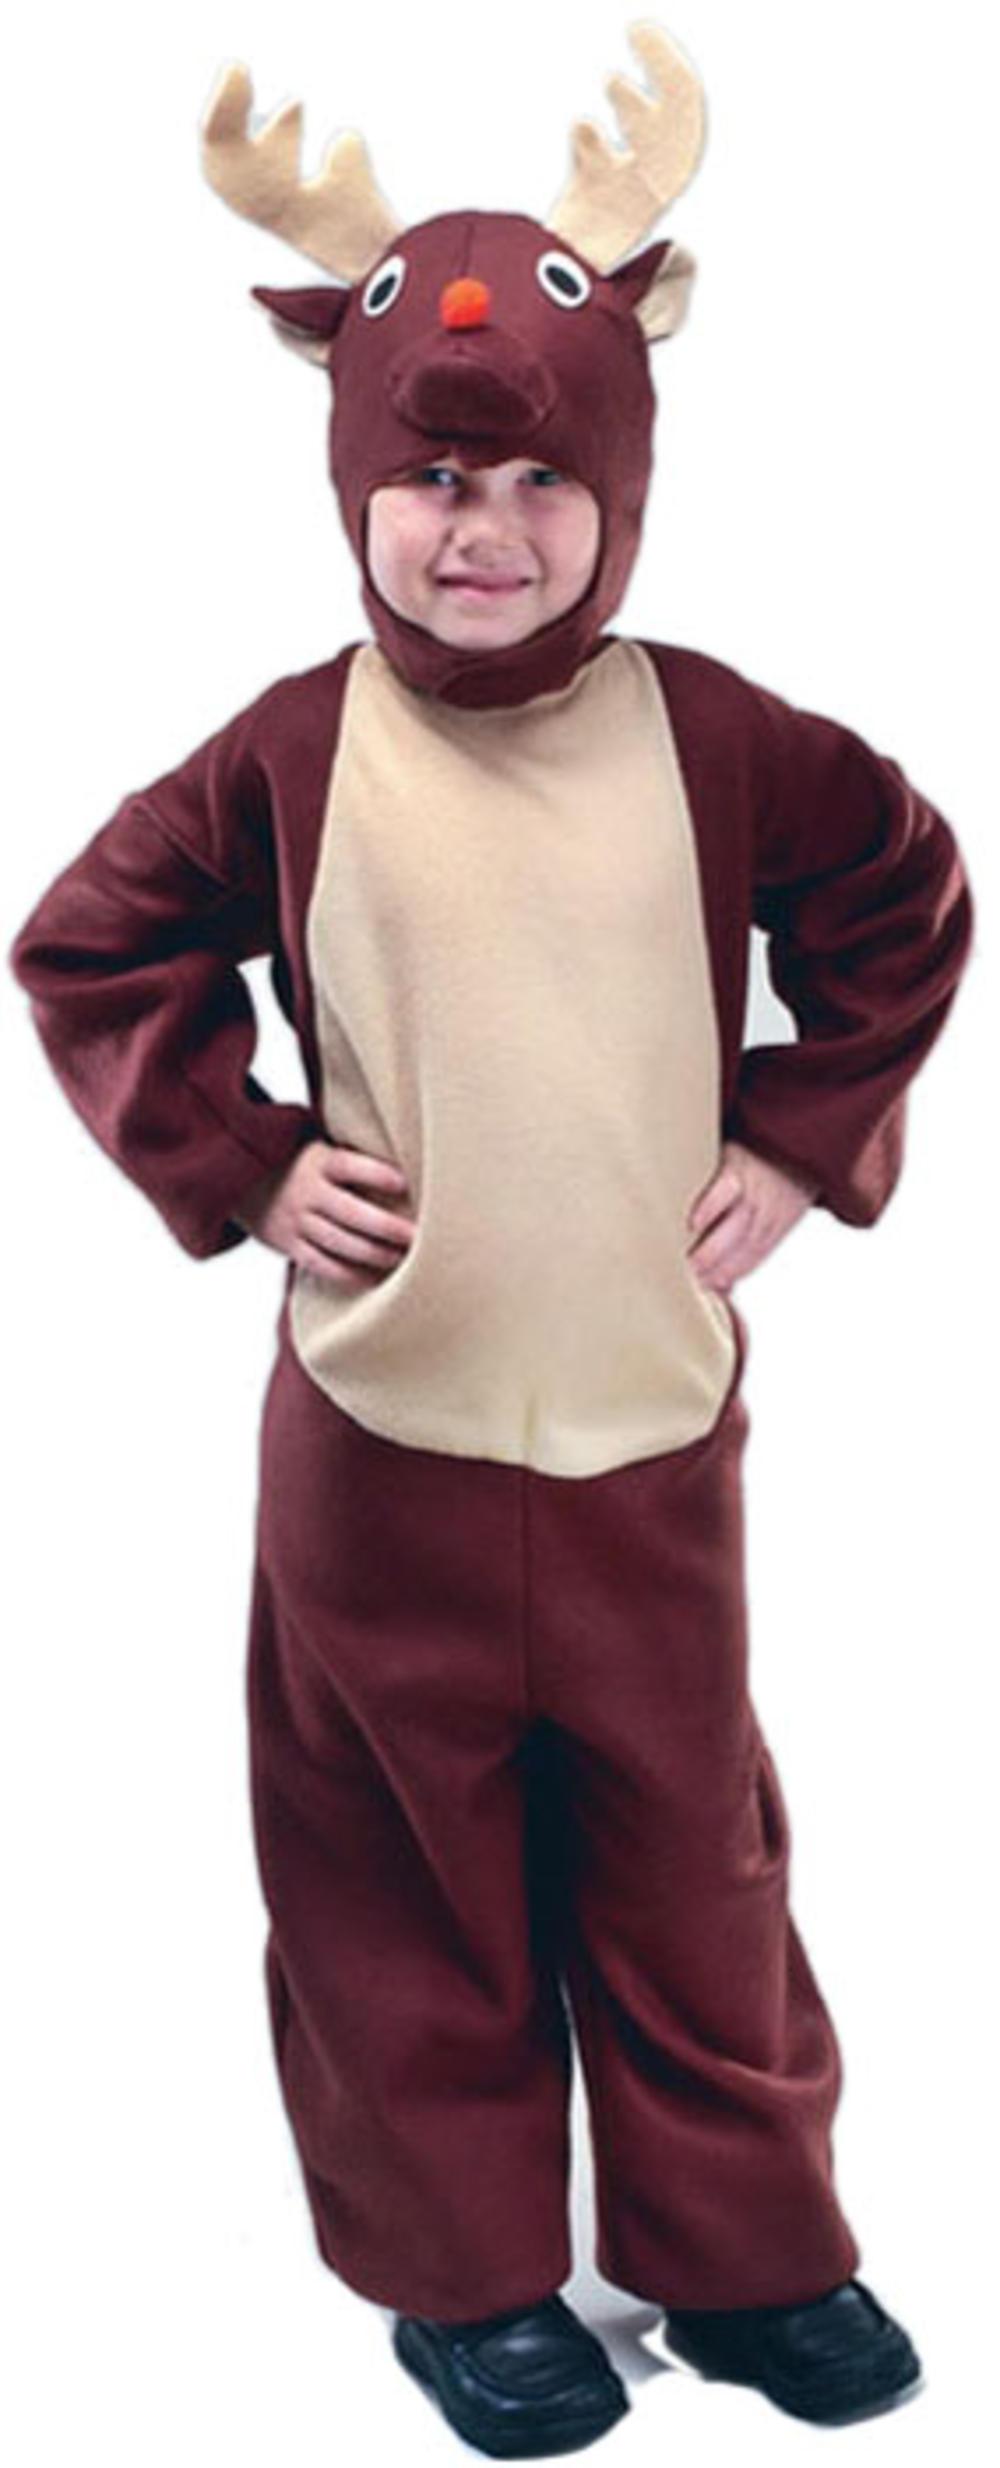 Reindeer Kids Fancy Dress Rudolph Christmas Animal Boys Girls Costume Outfit